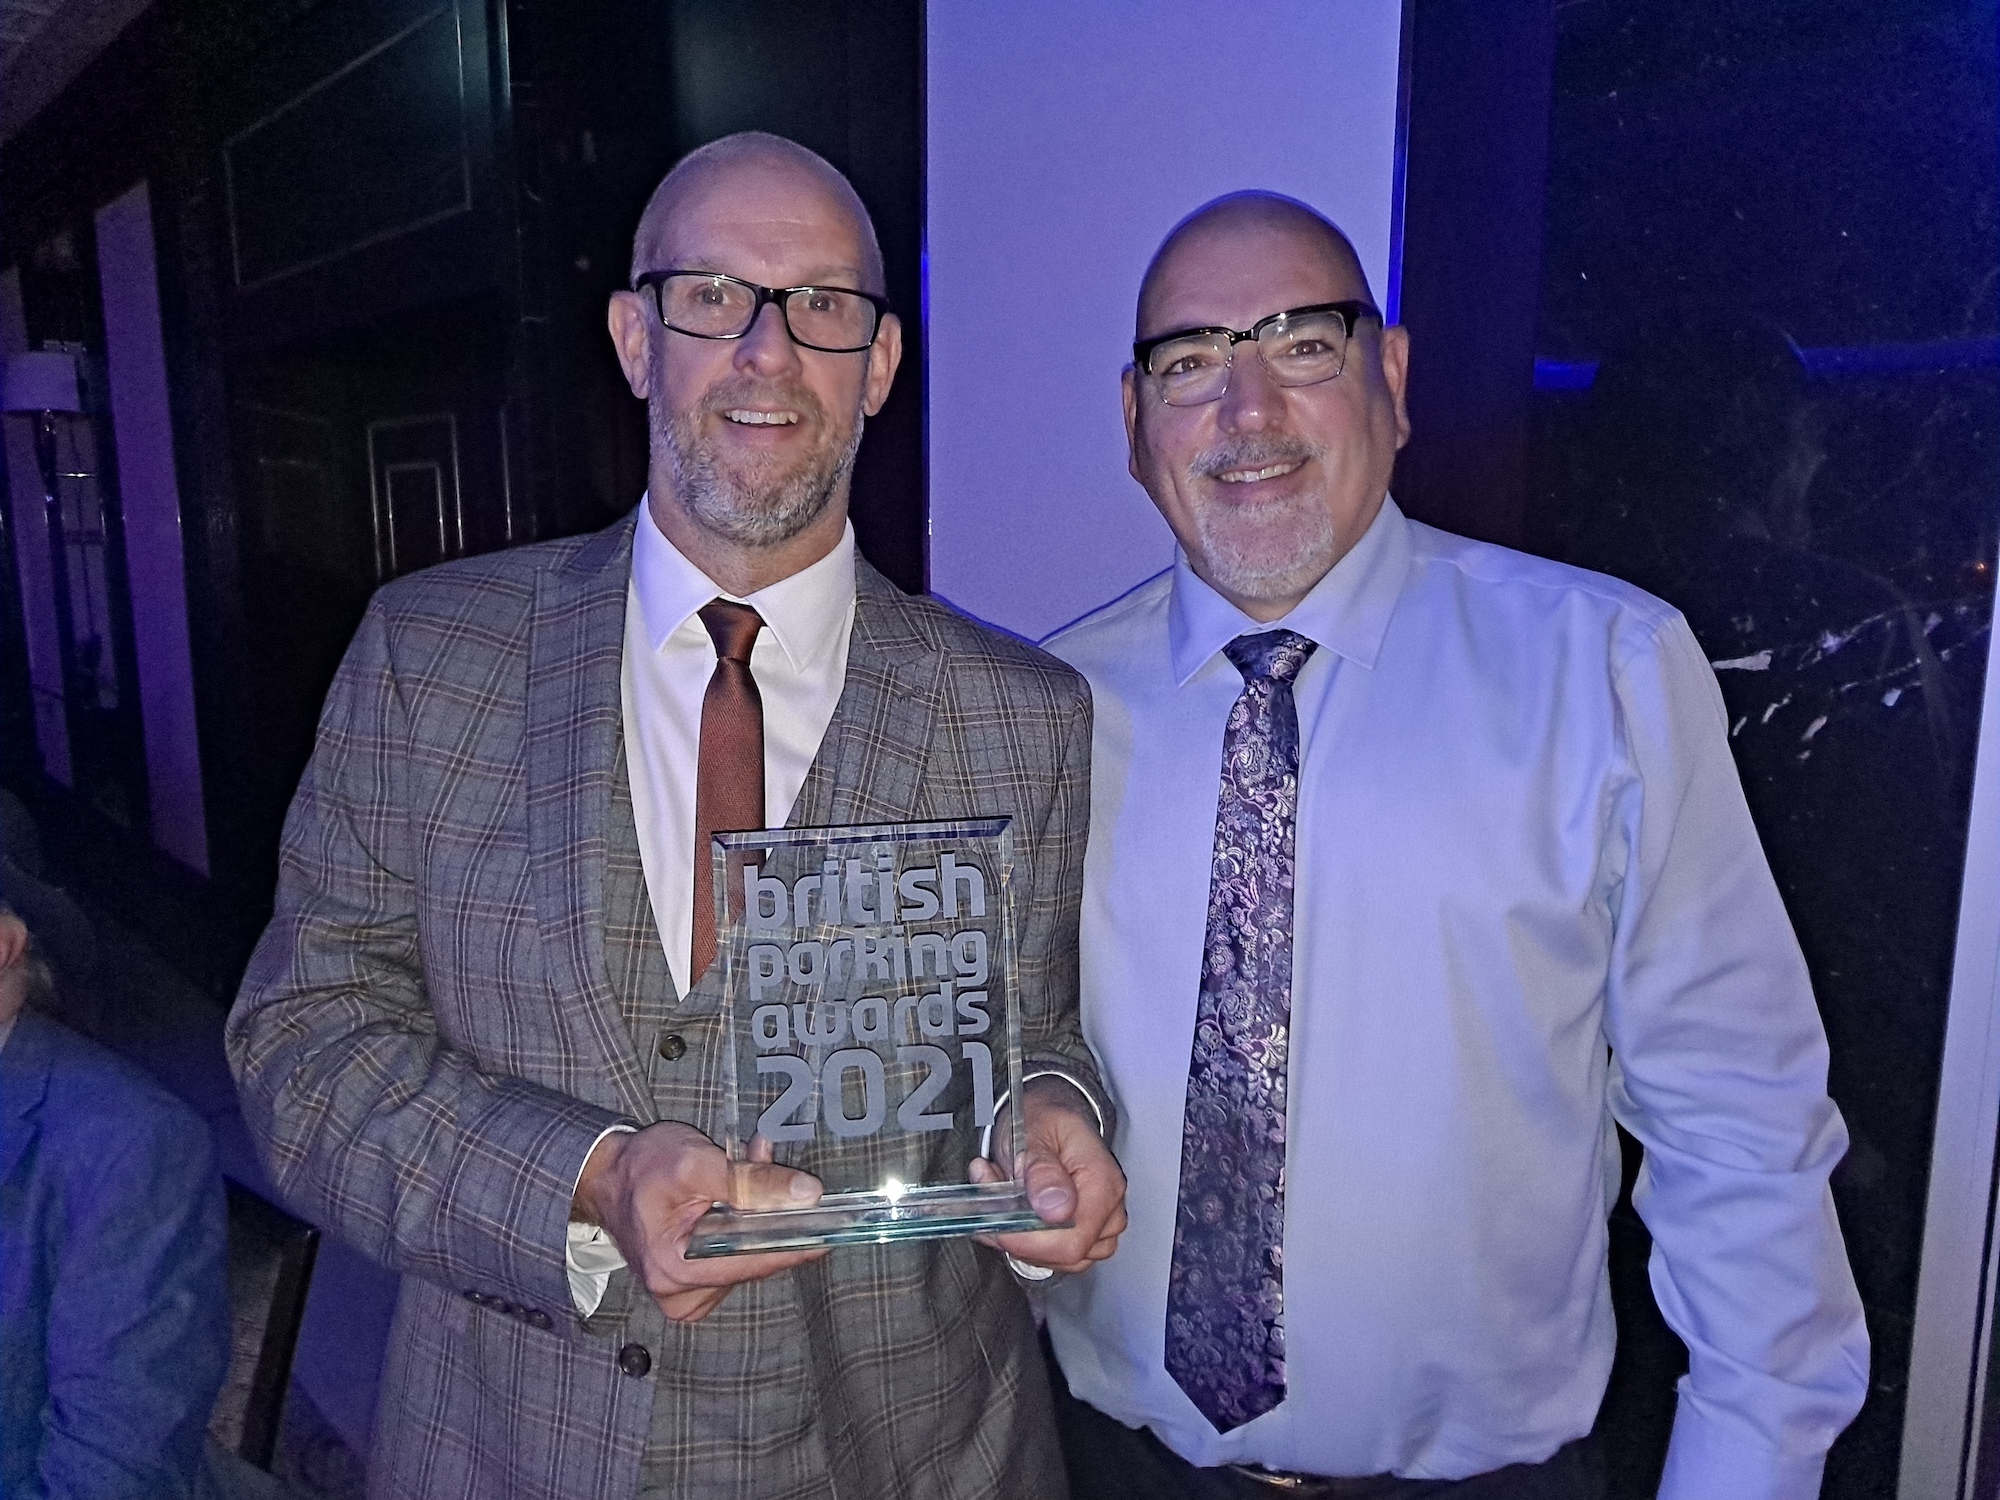 Another award for Penham Excel - British Parking Awards